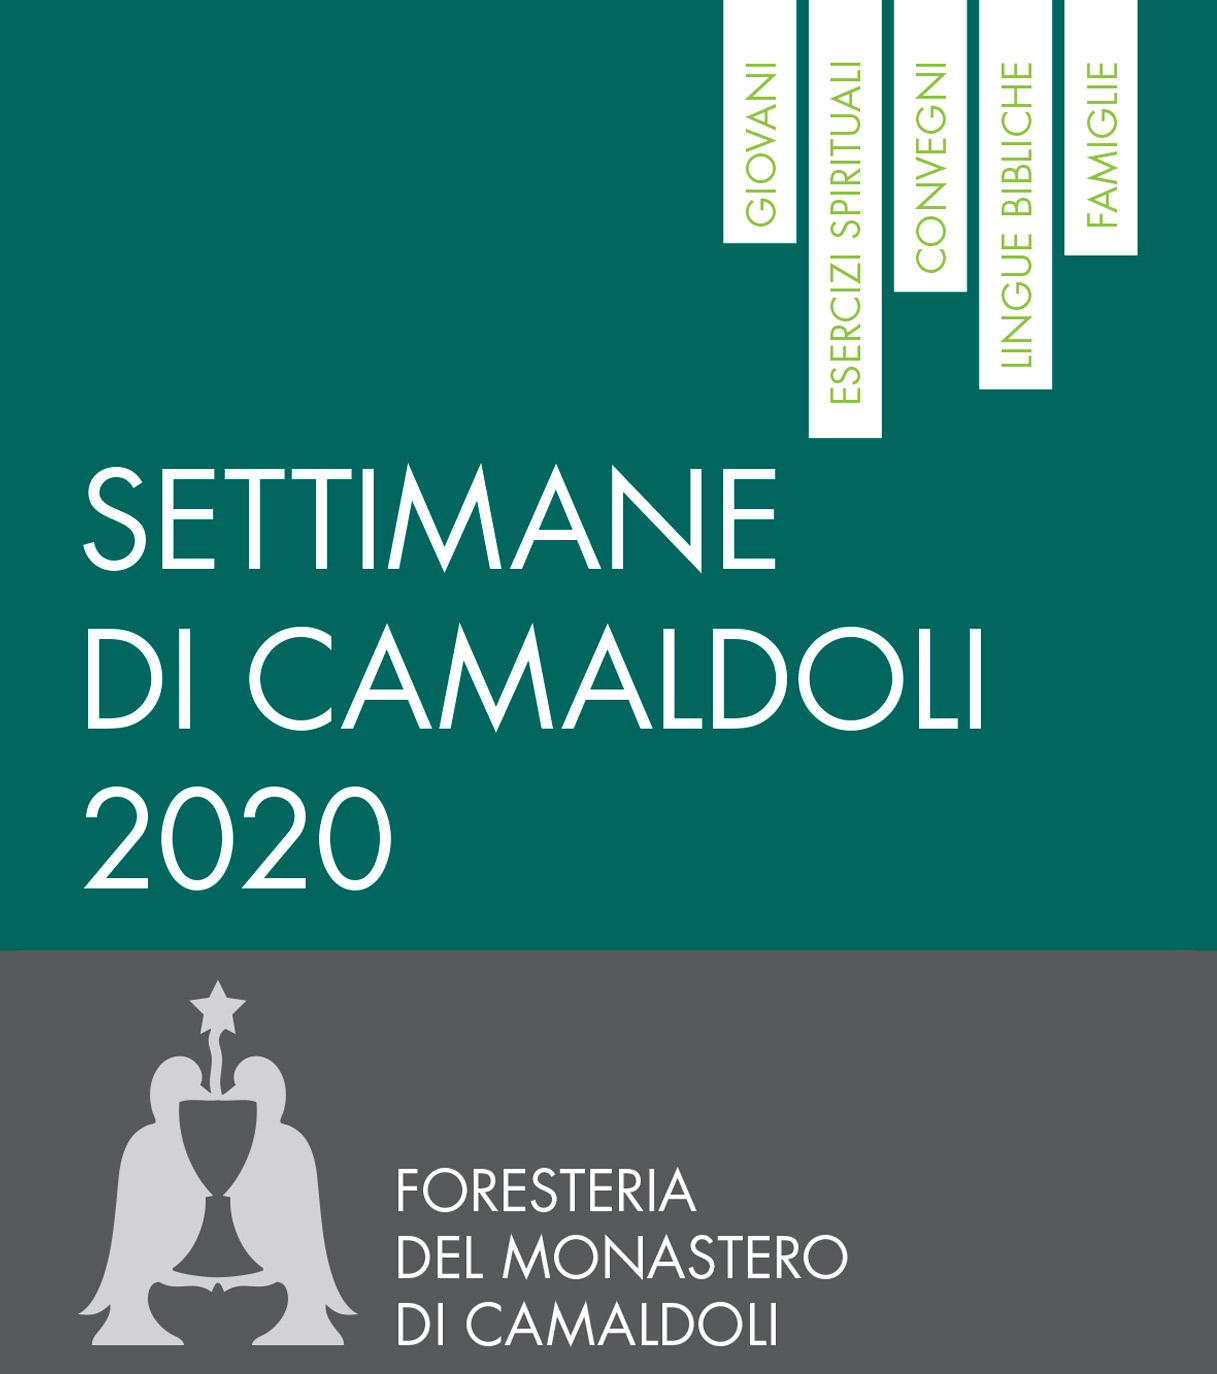 Settimane-di-Camaldoli-2020